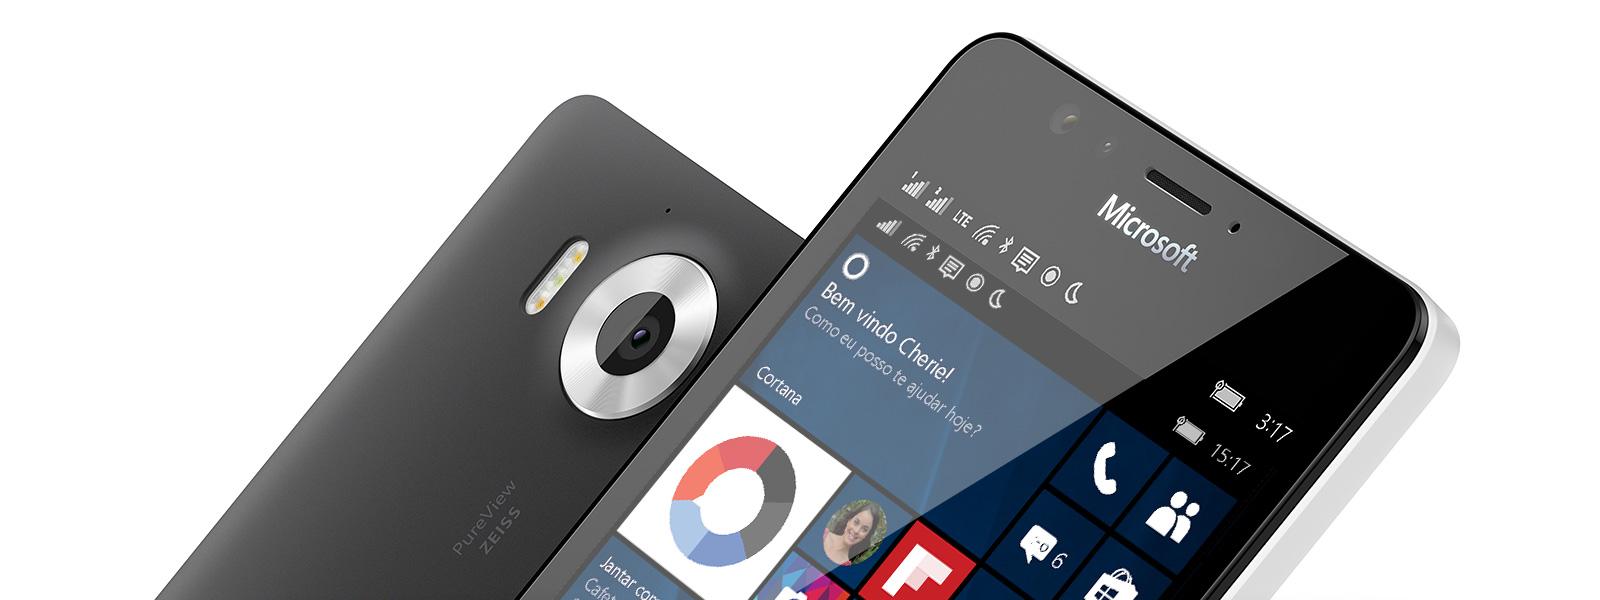 Smartphones Windows 10 Mobile